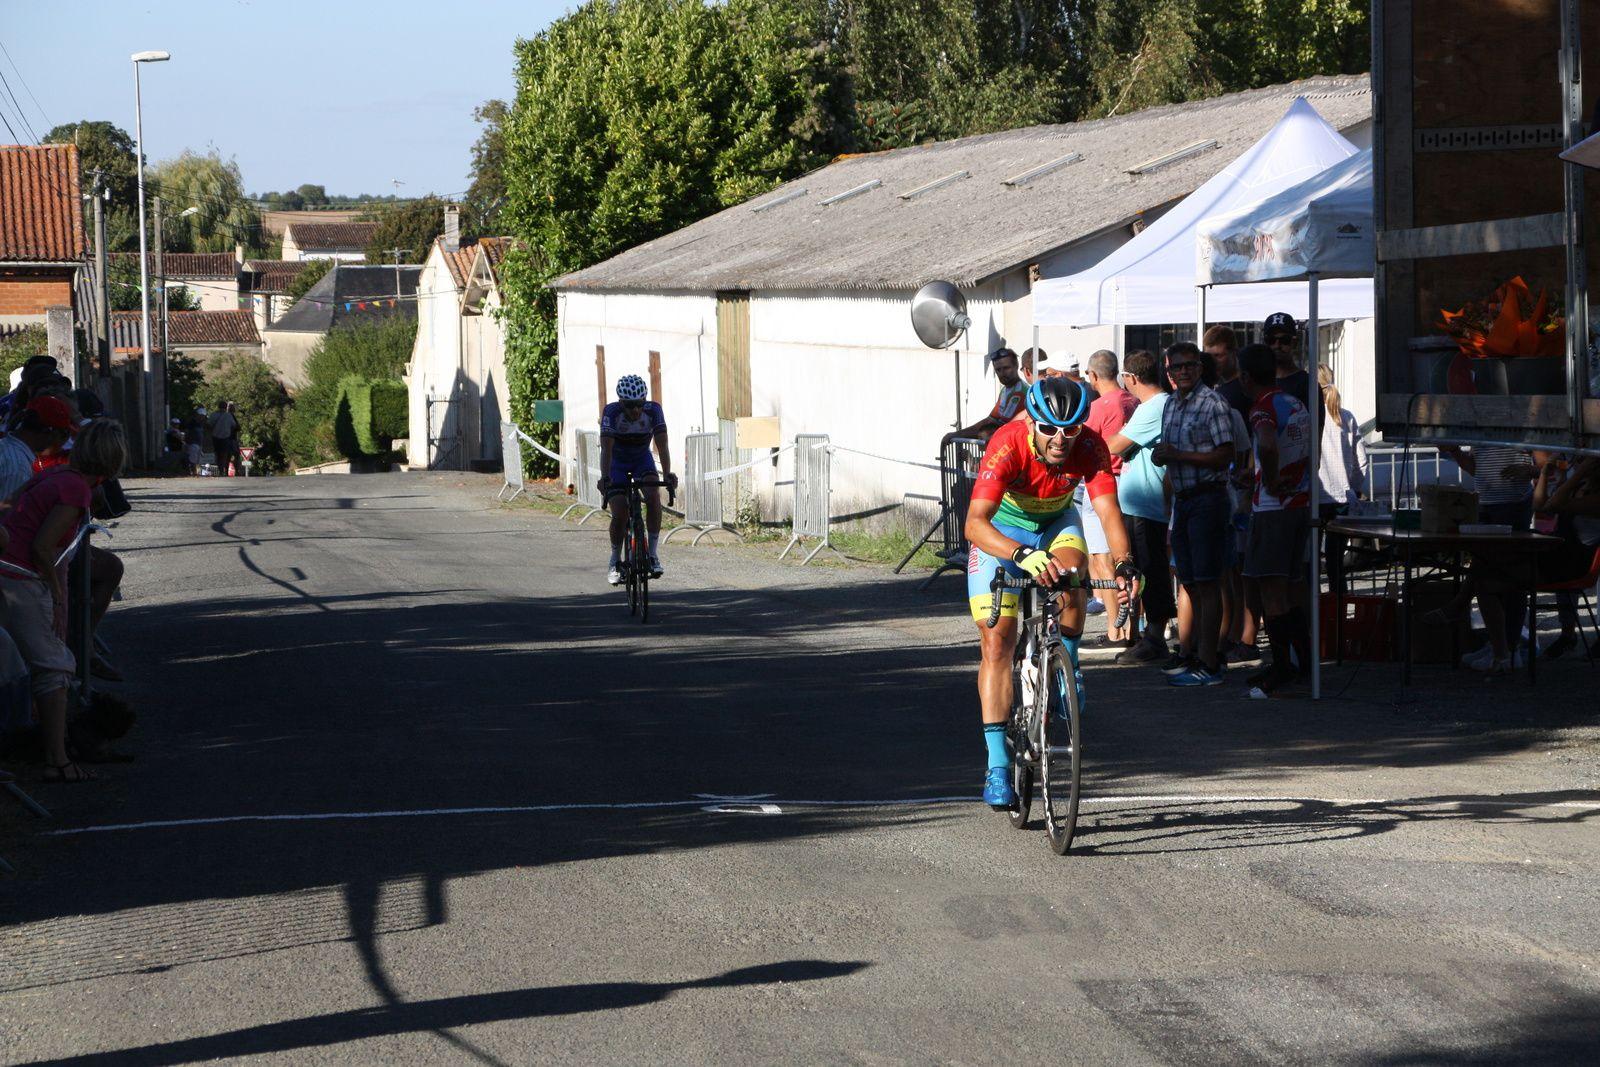 7e  Romain  BIRAUD(UCC  Vivonne), 8e  Stéphane  DURAND(AC  Nersac), 9e  Ludovic  VASSEUR (US  Gravelinoise)